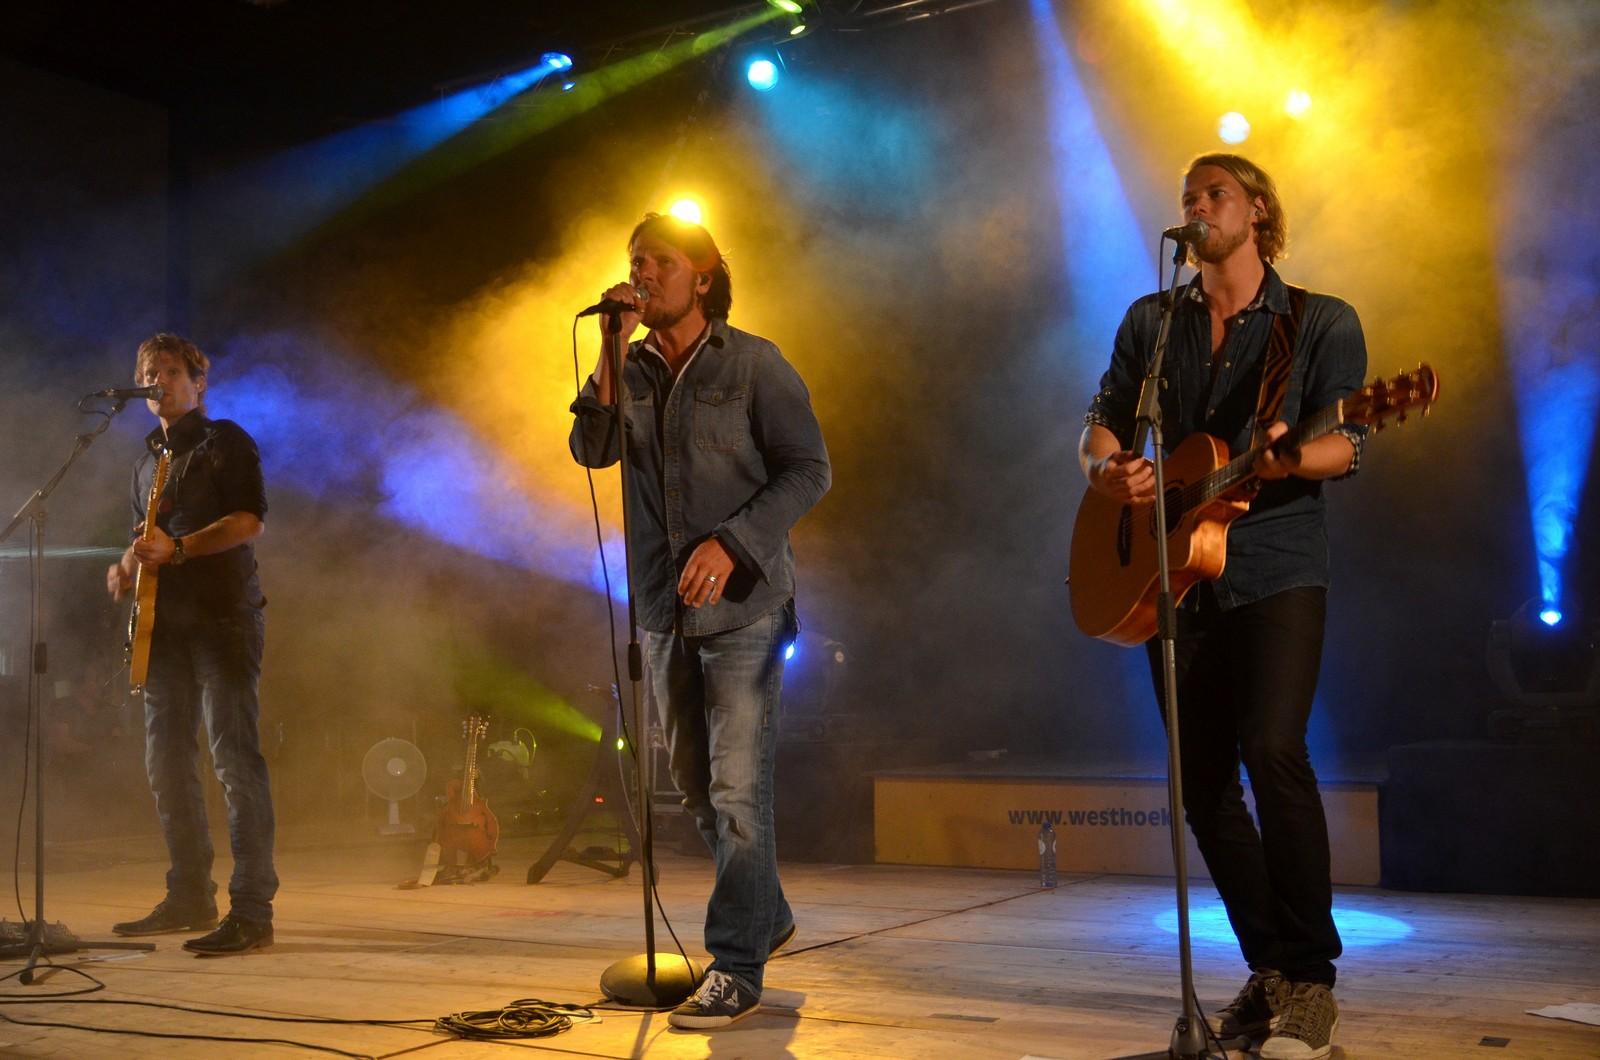 Westhoekfeest 2014